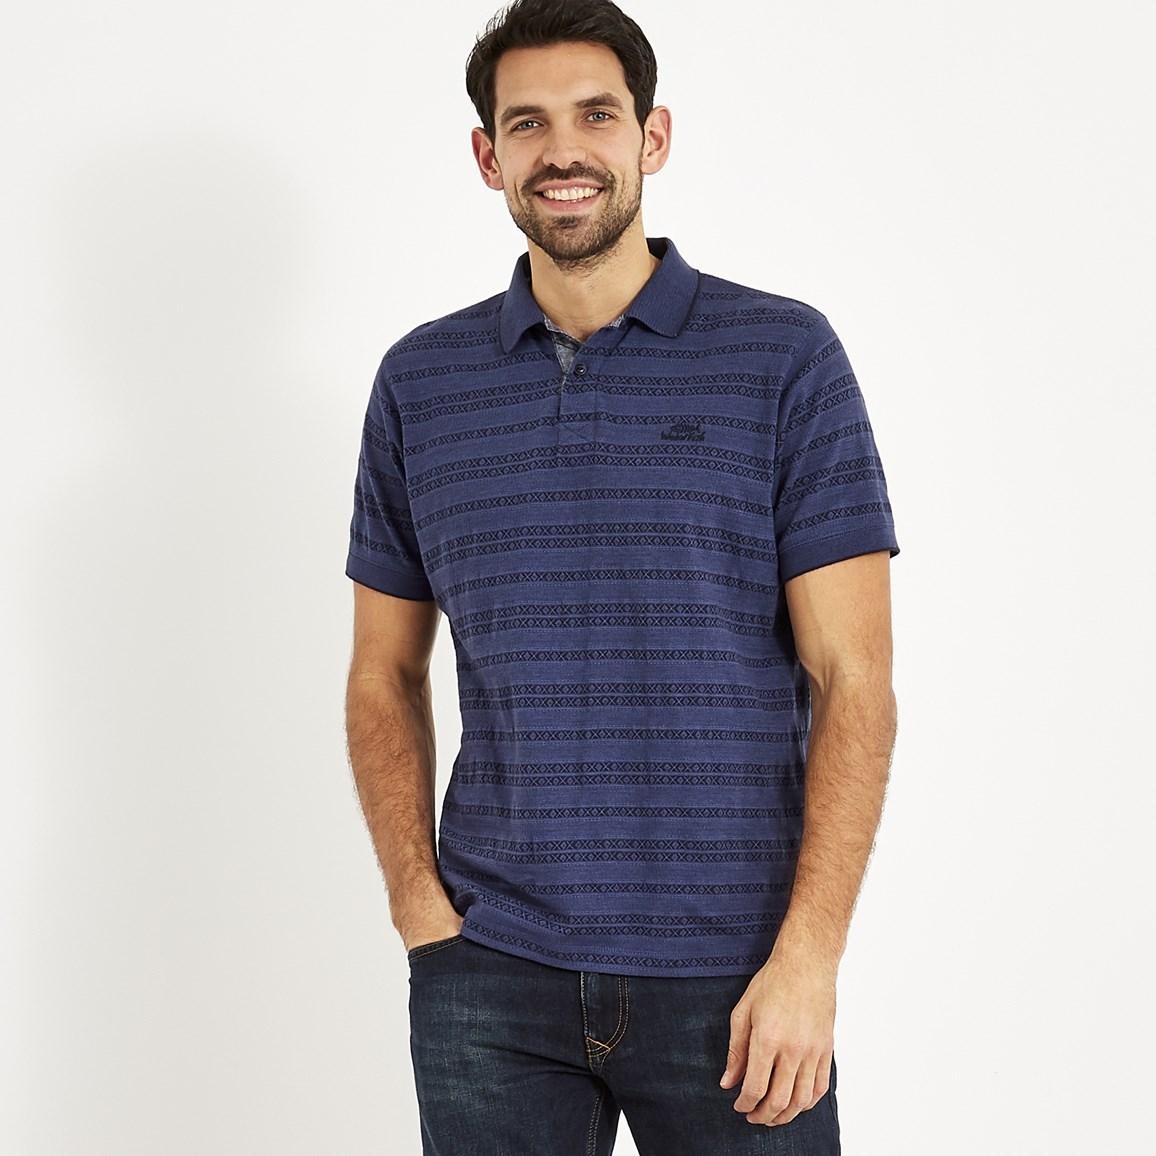 b4b77048d8b0 Baskin Jacquard Striped Polo Shirt Dark Navy